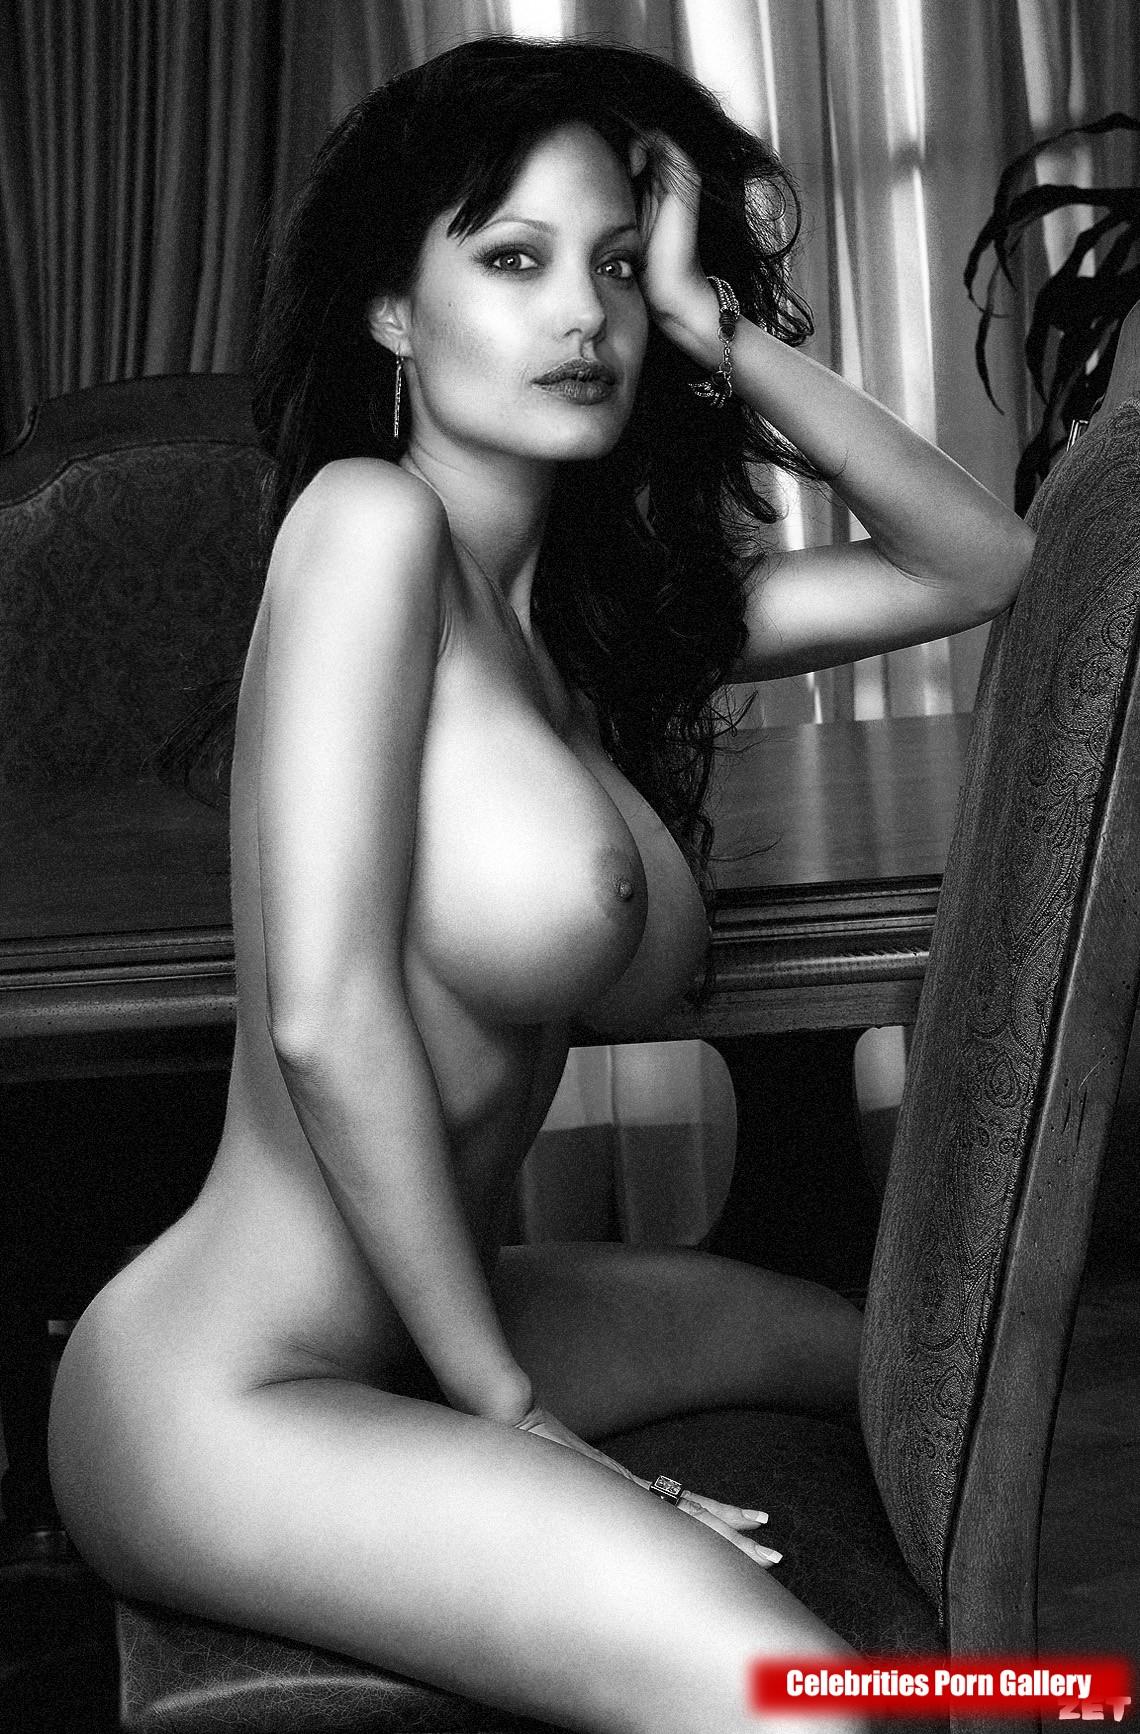 Anglelina jolie naked #14